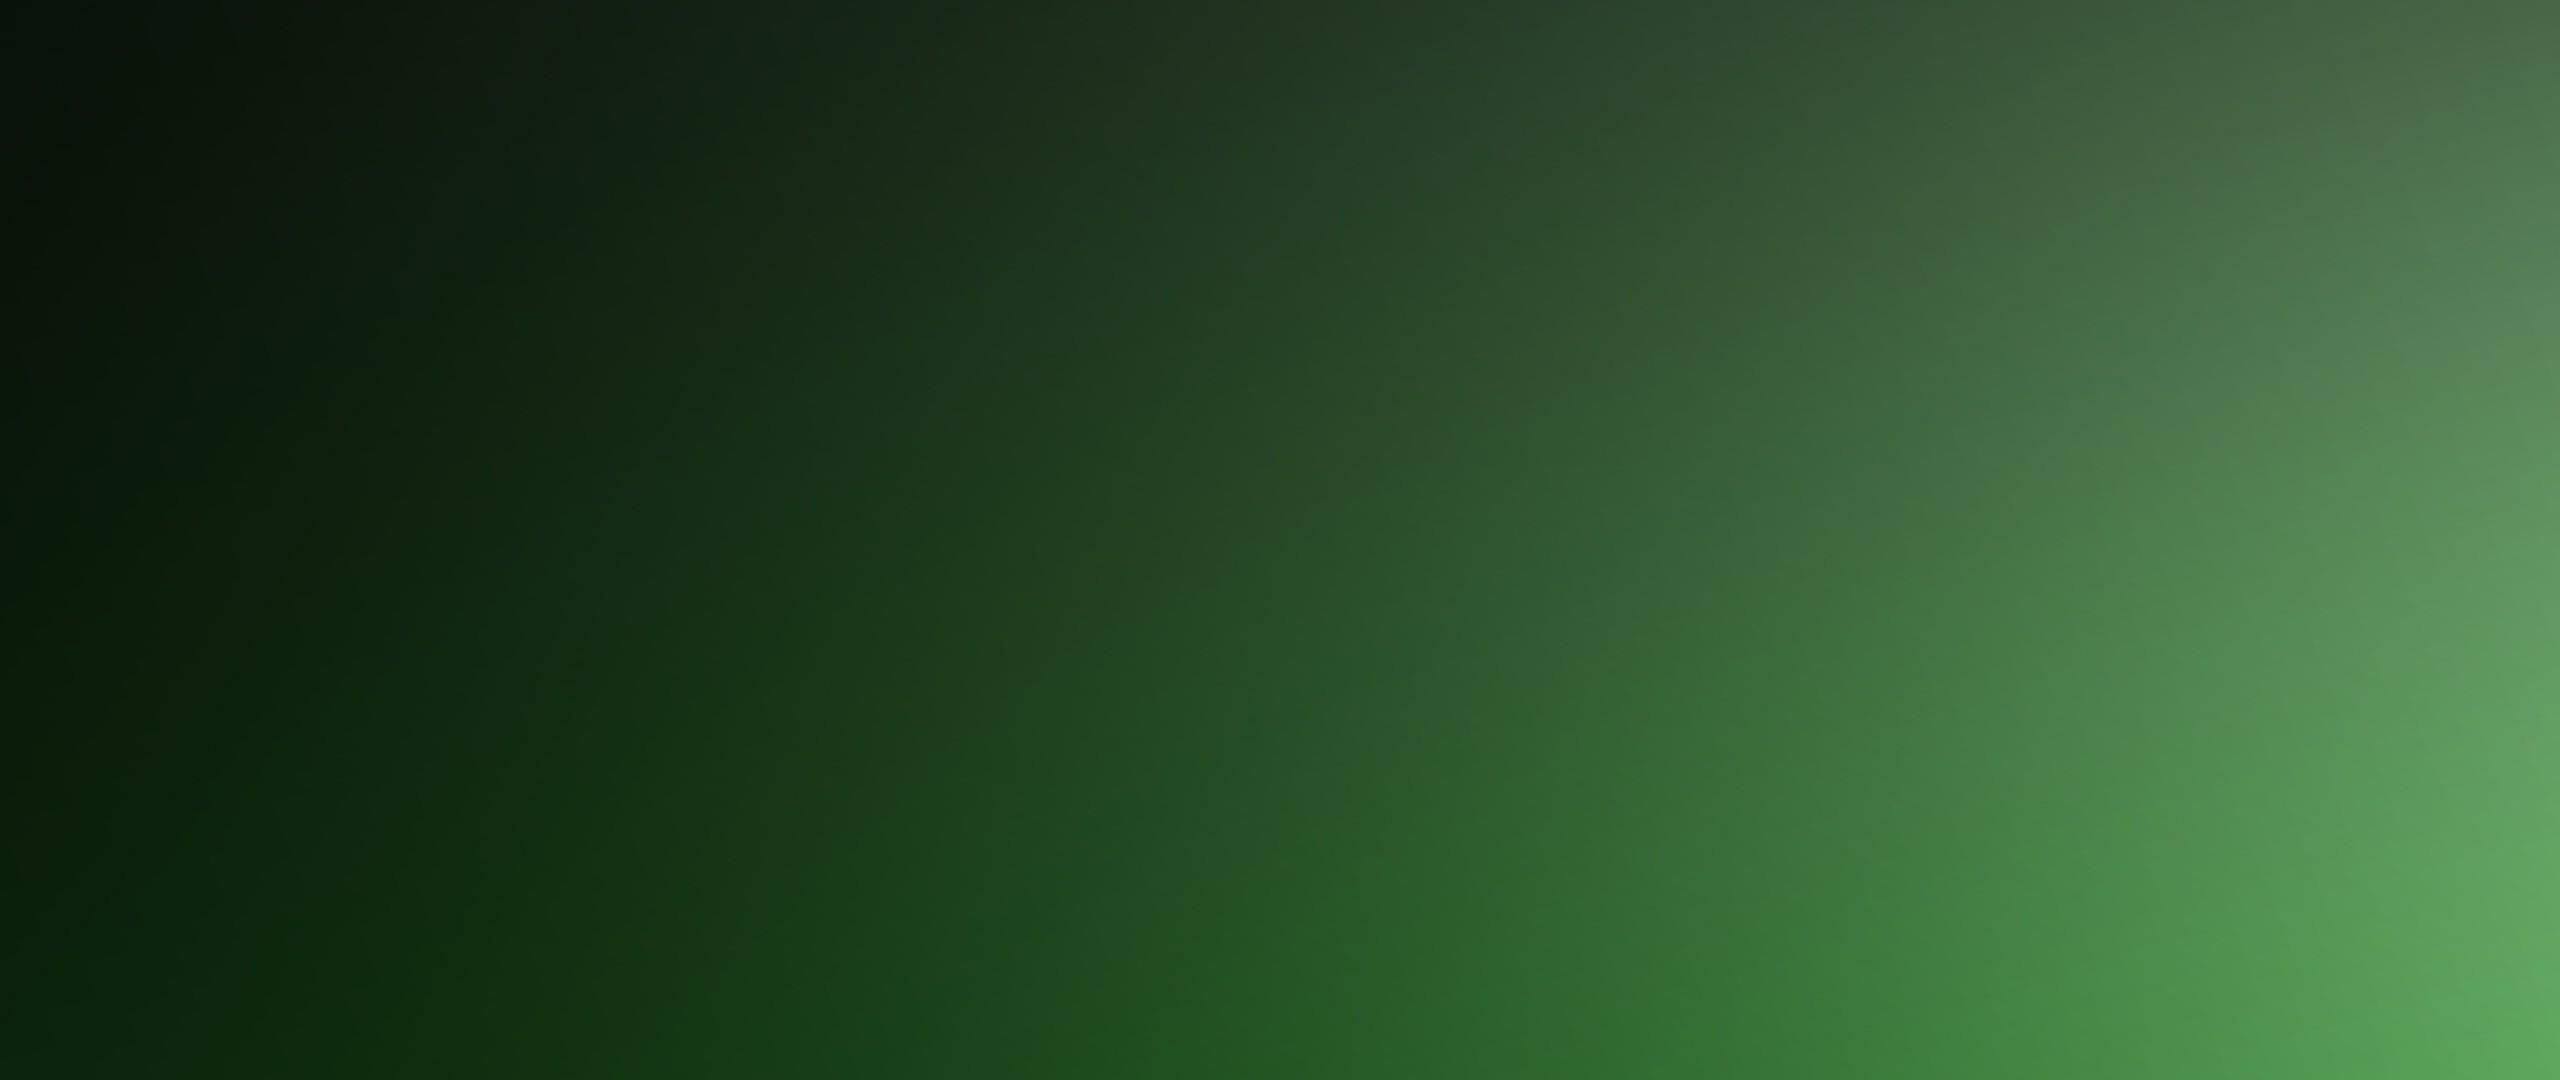 Solid green desktop wallpaper